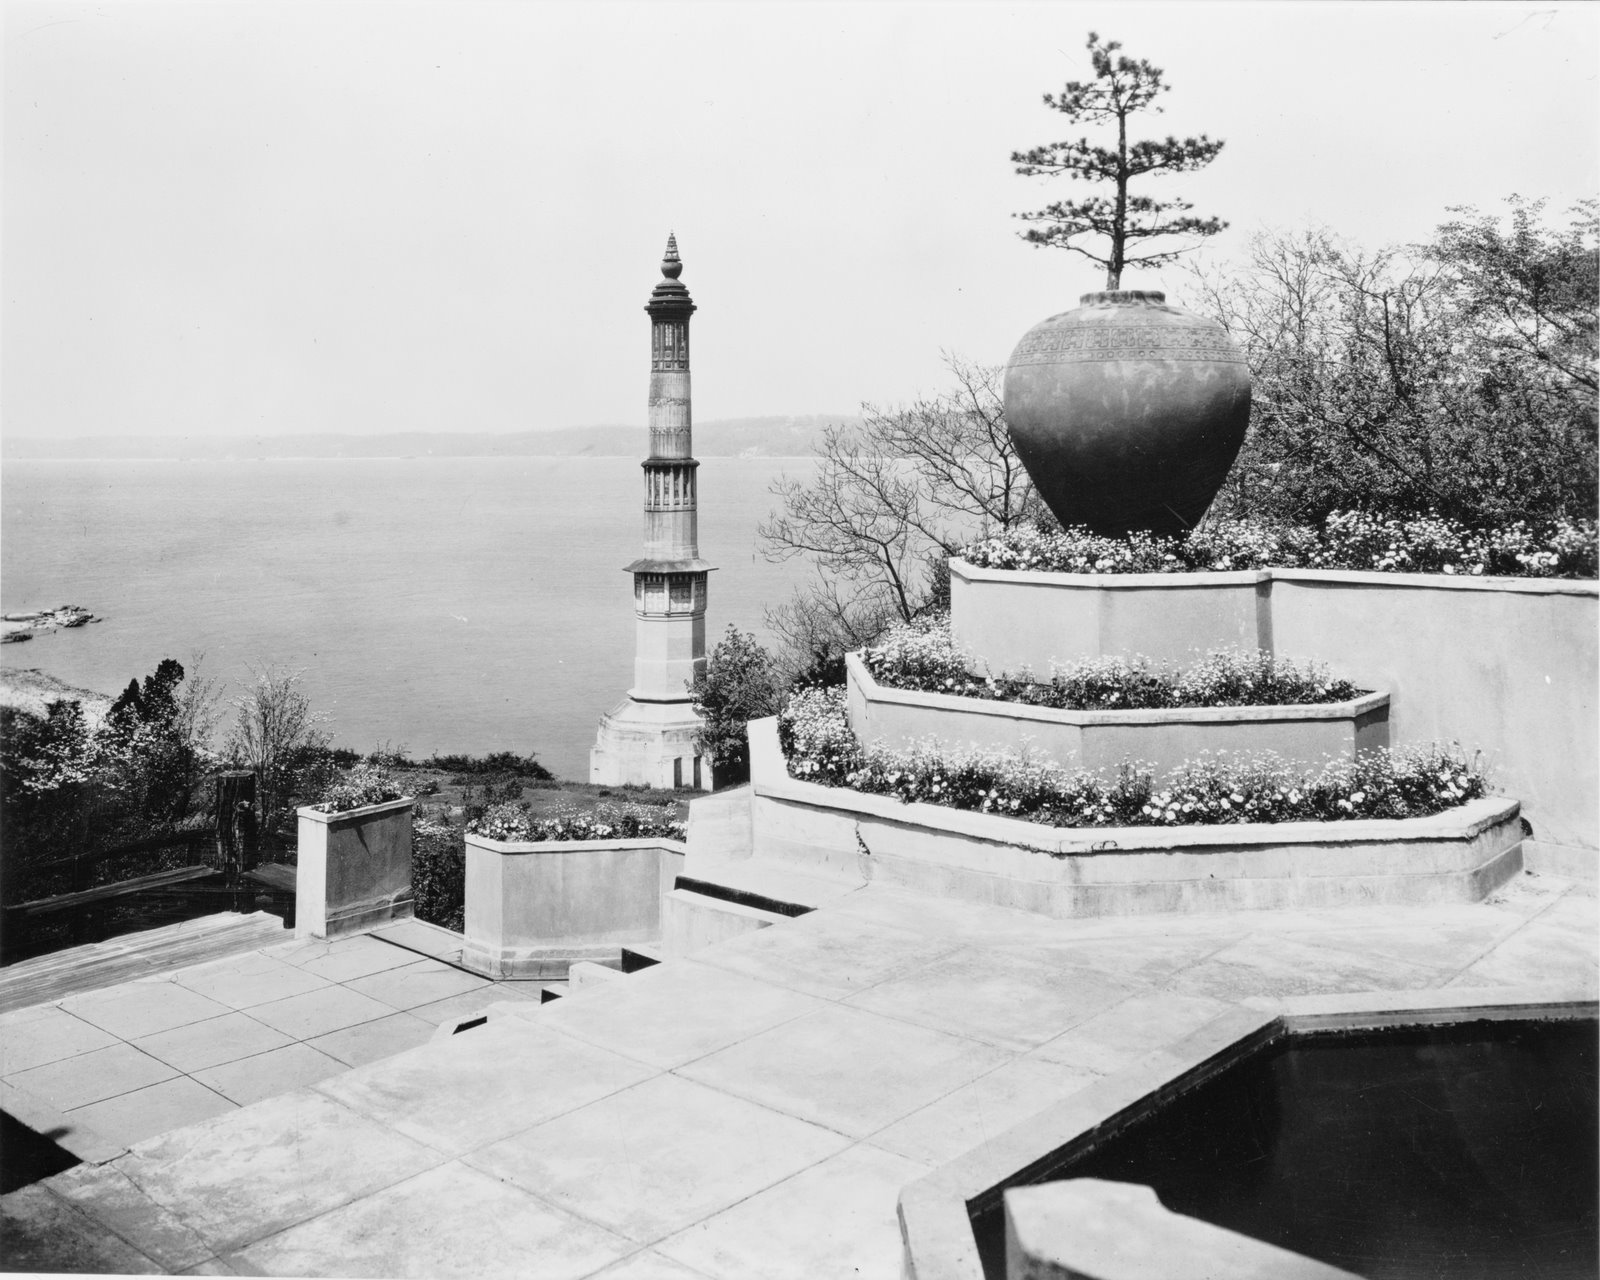 Historical photo of the minaret at Laurelton Hall (courtesy of http://www.oldlongisland.com/)